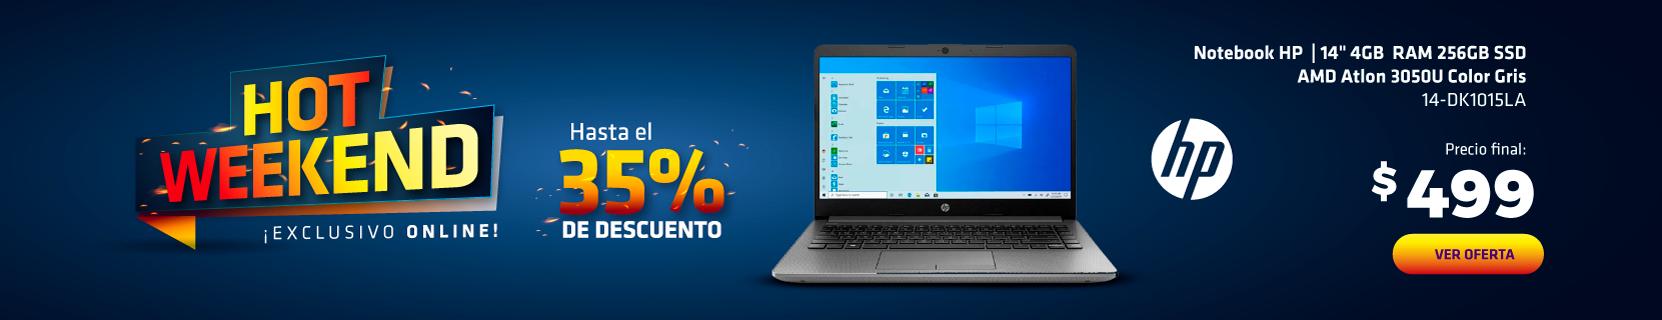 hotweek laptop